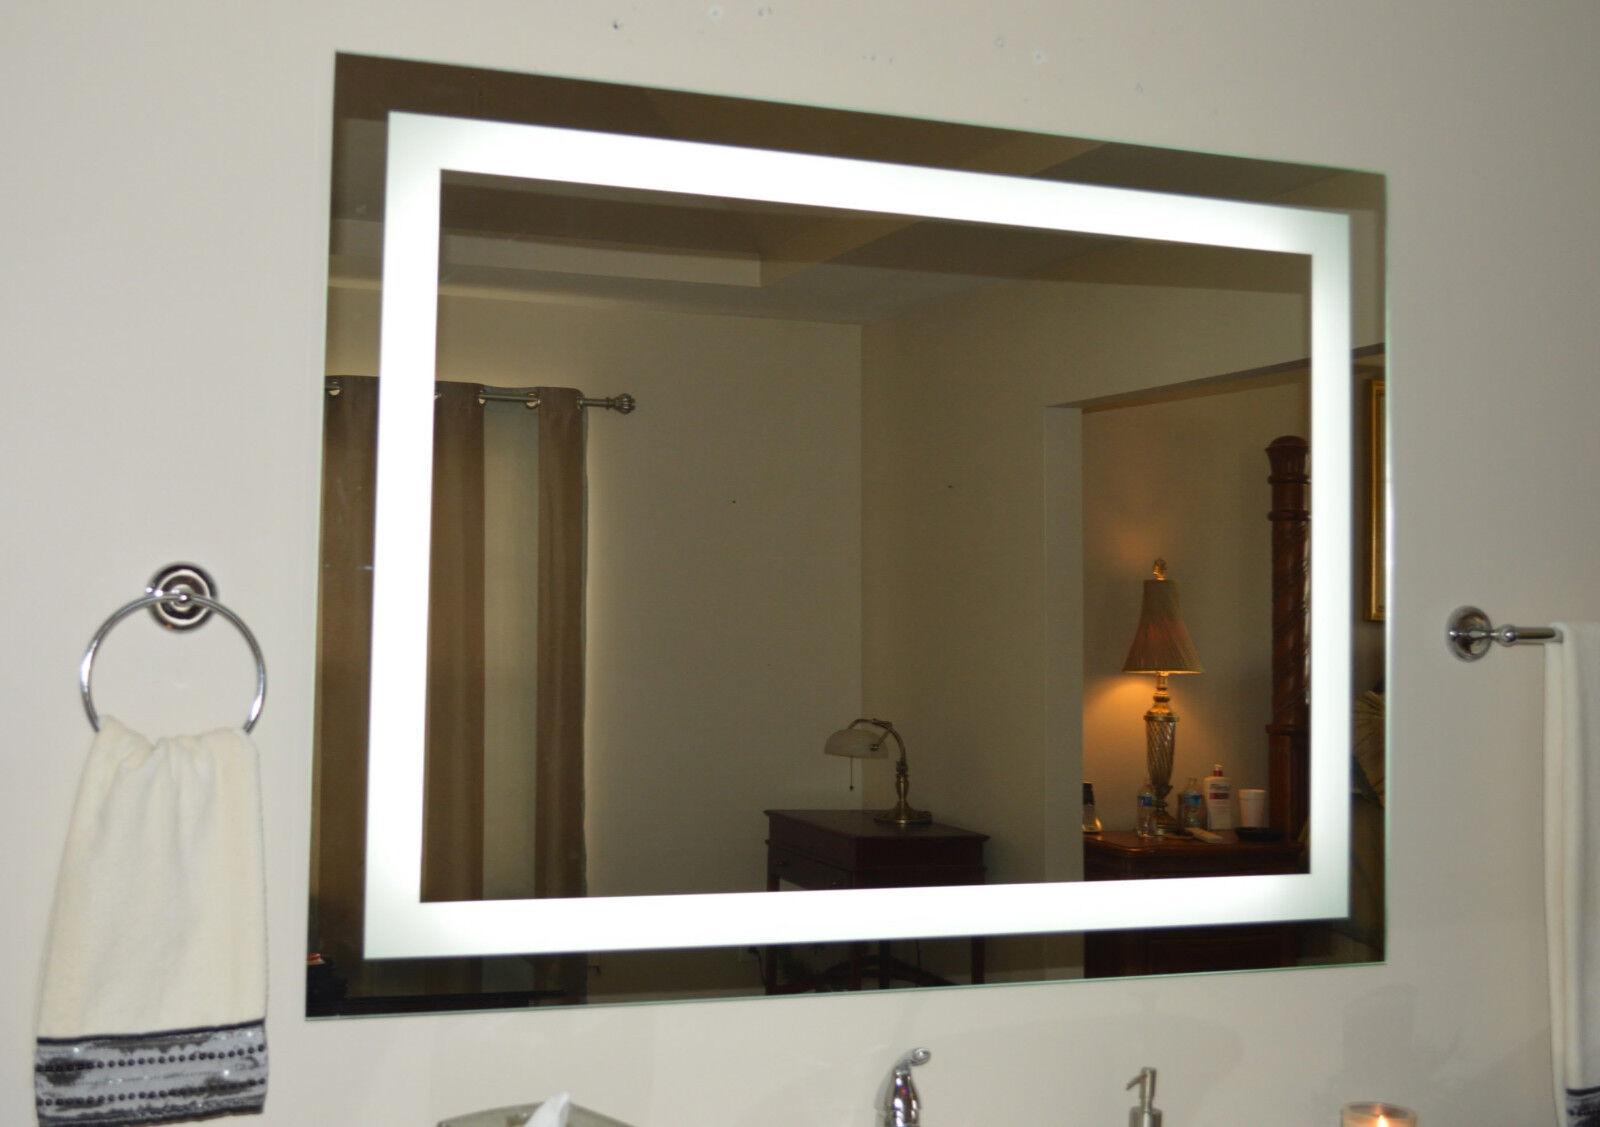 Lighted Bathroom Vanity Mirror, Led , Wall Mounted, 48